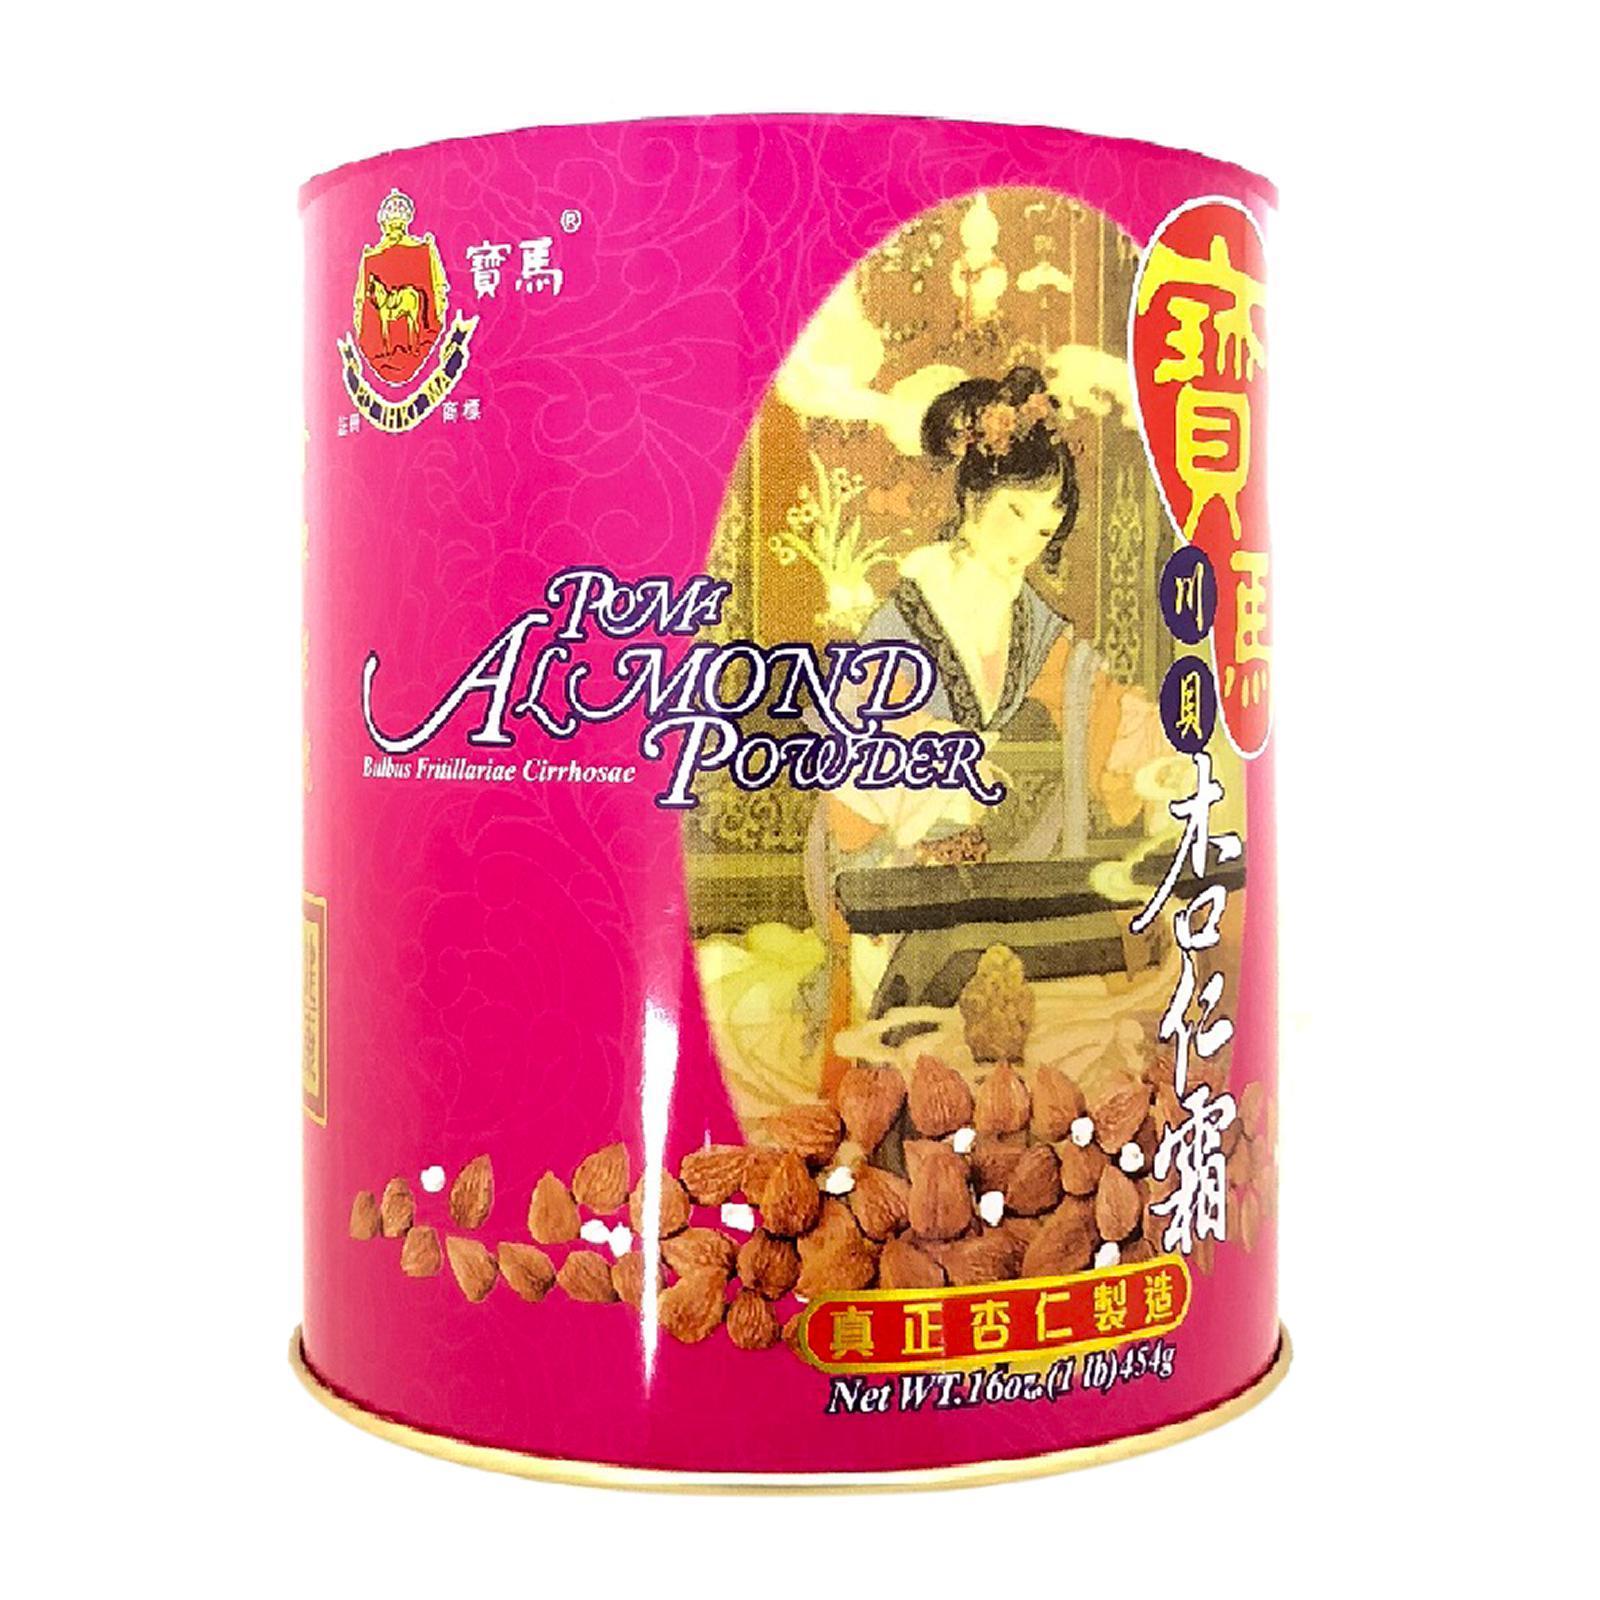 Poma Almond Instant Powder By Redmart.